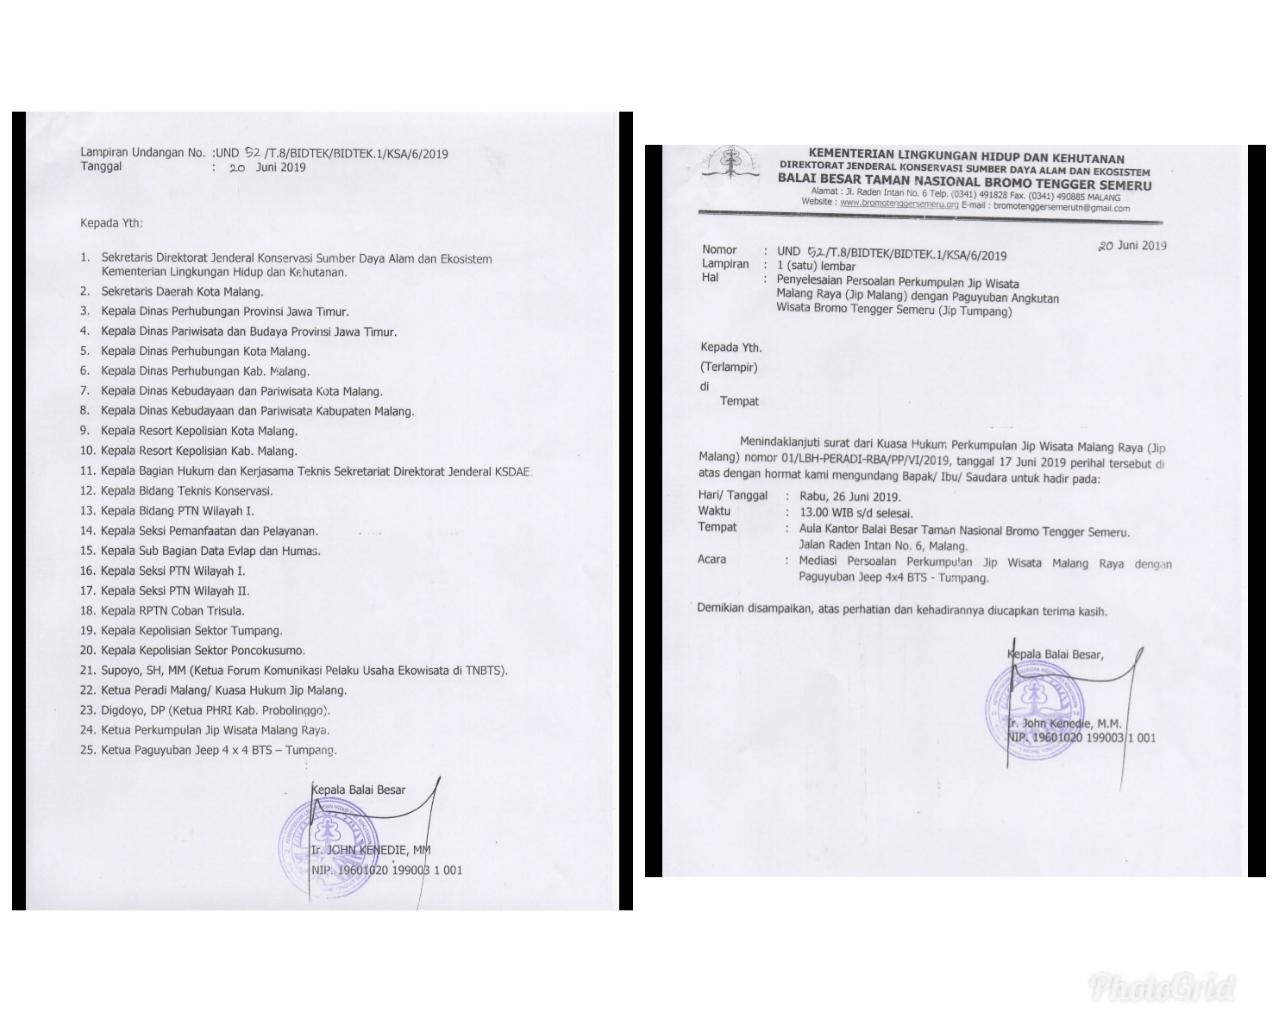 Surat undangan mediasi di BB TNBTS (ist)